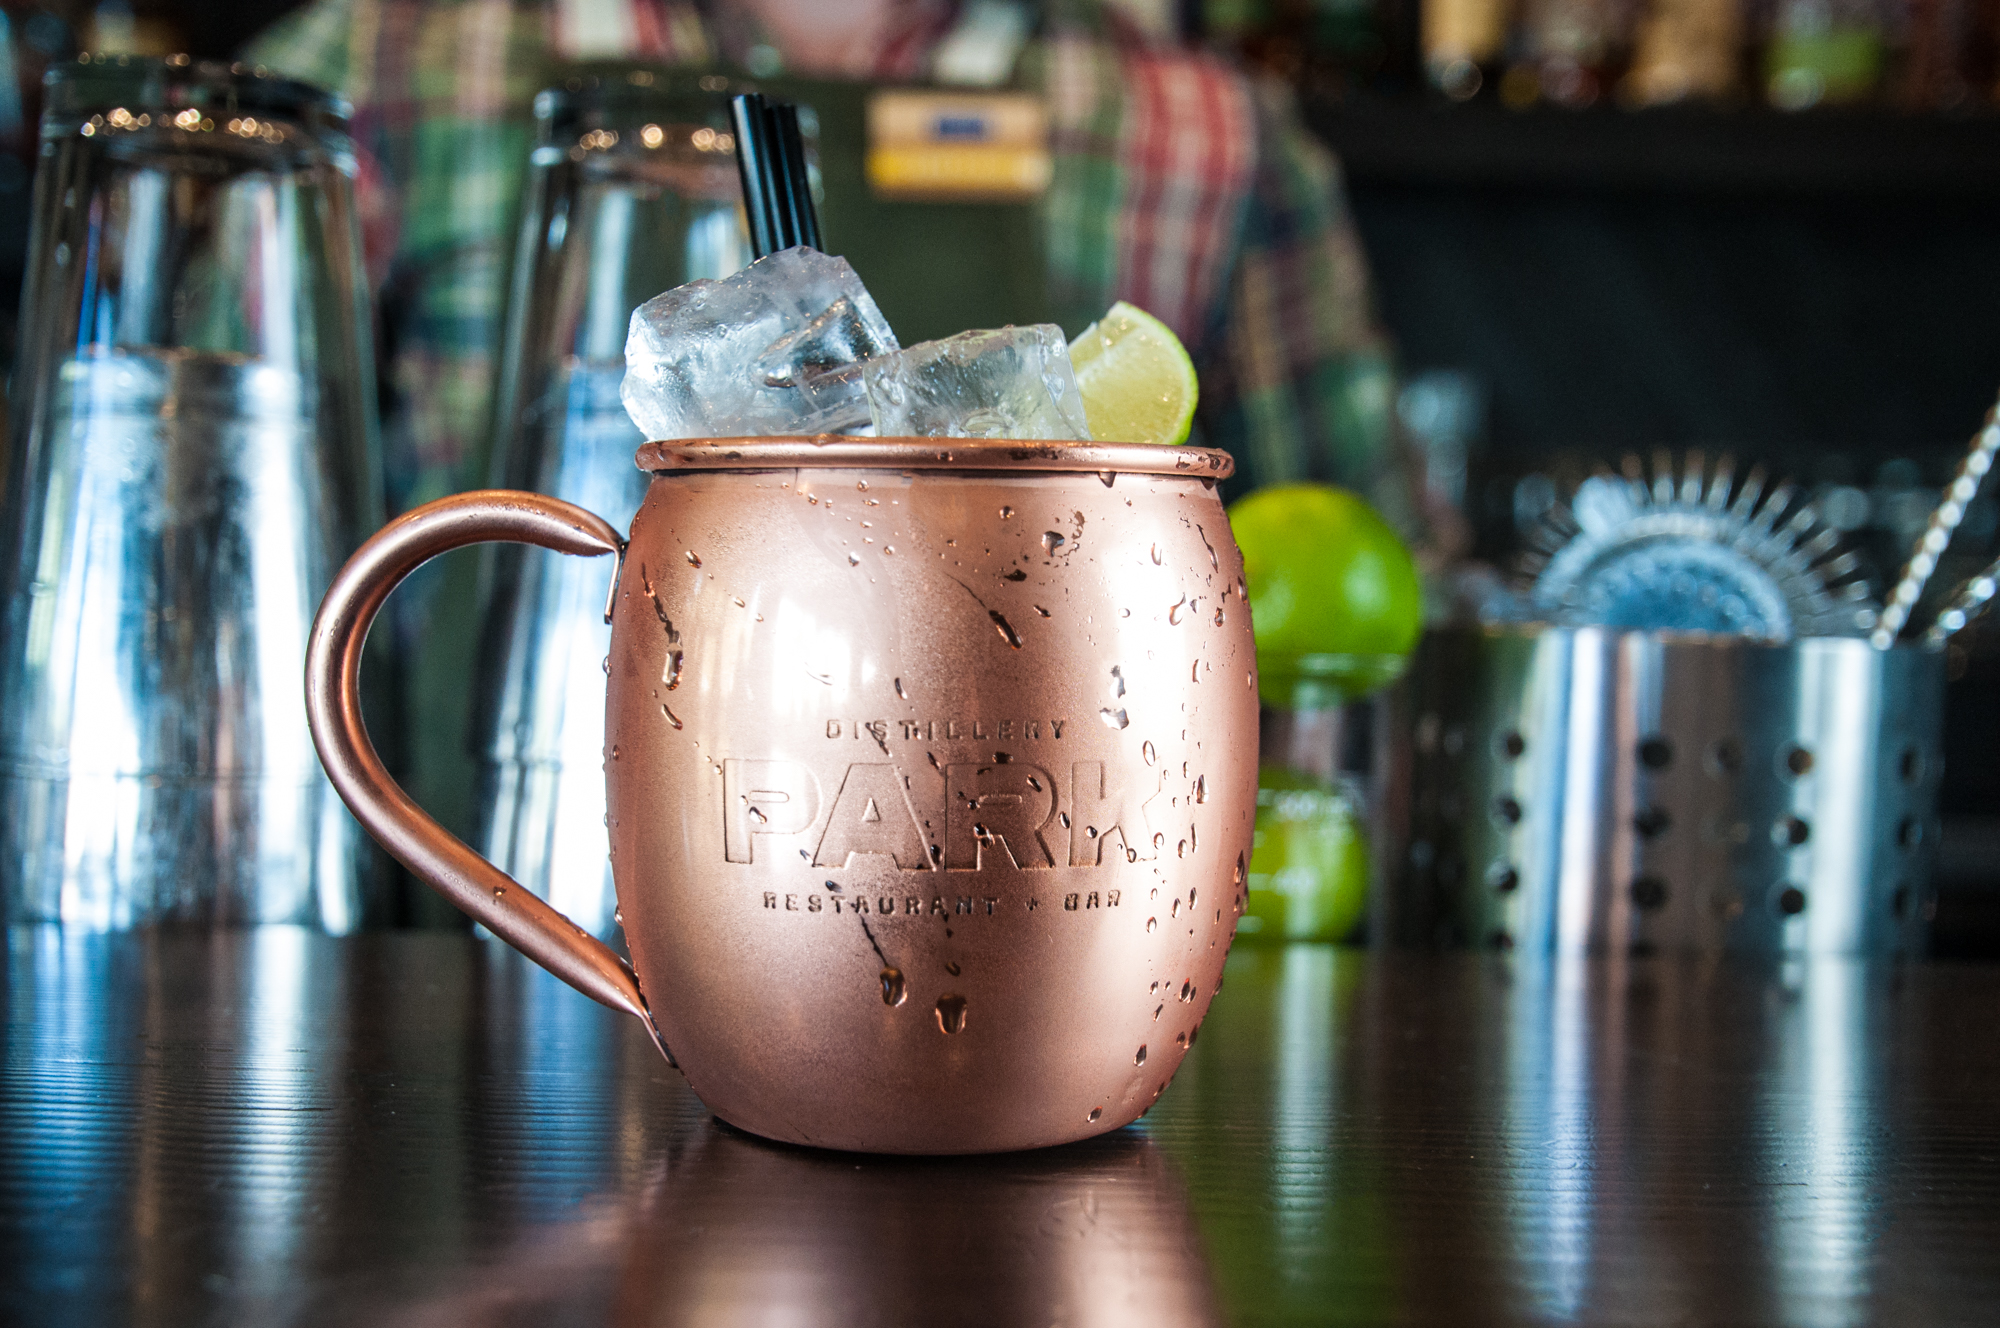 Park Distillery Fifi's Mule Cocktail | Photo Credit: Anna Robi